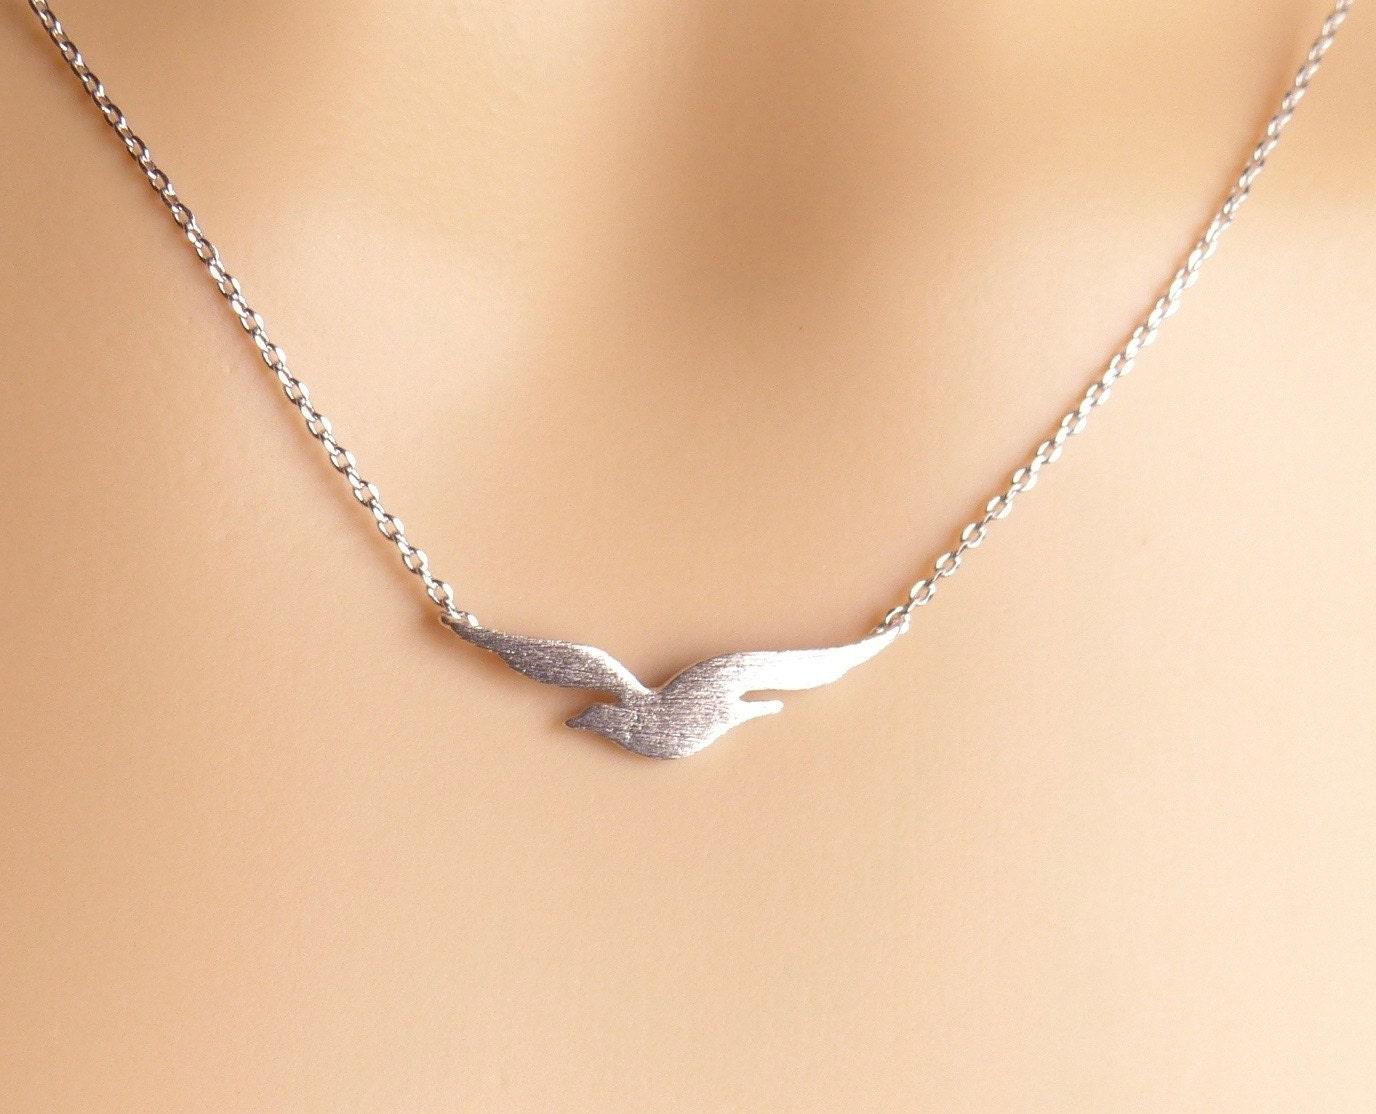 Soar bird necklace Silver seagull necklace/bird